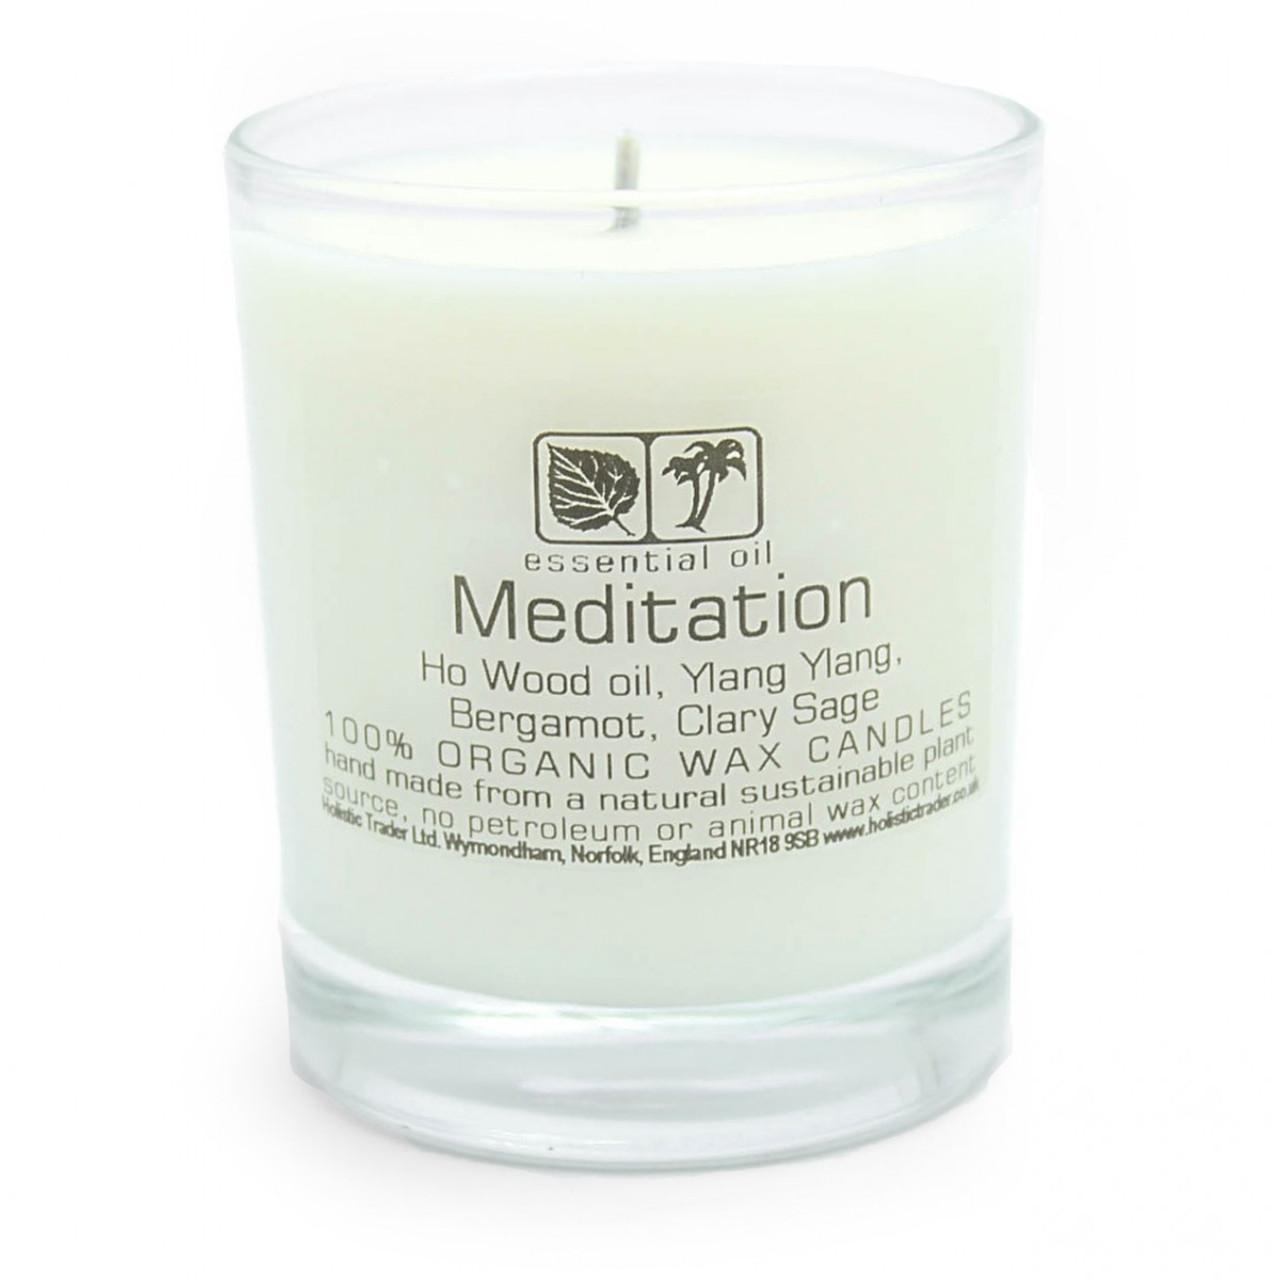 Meditation Aromatherapy Candle (Large, 40-50 Hours)